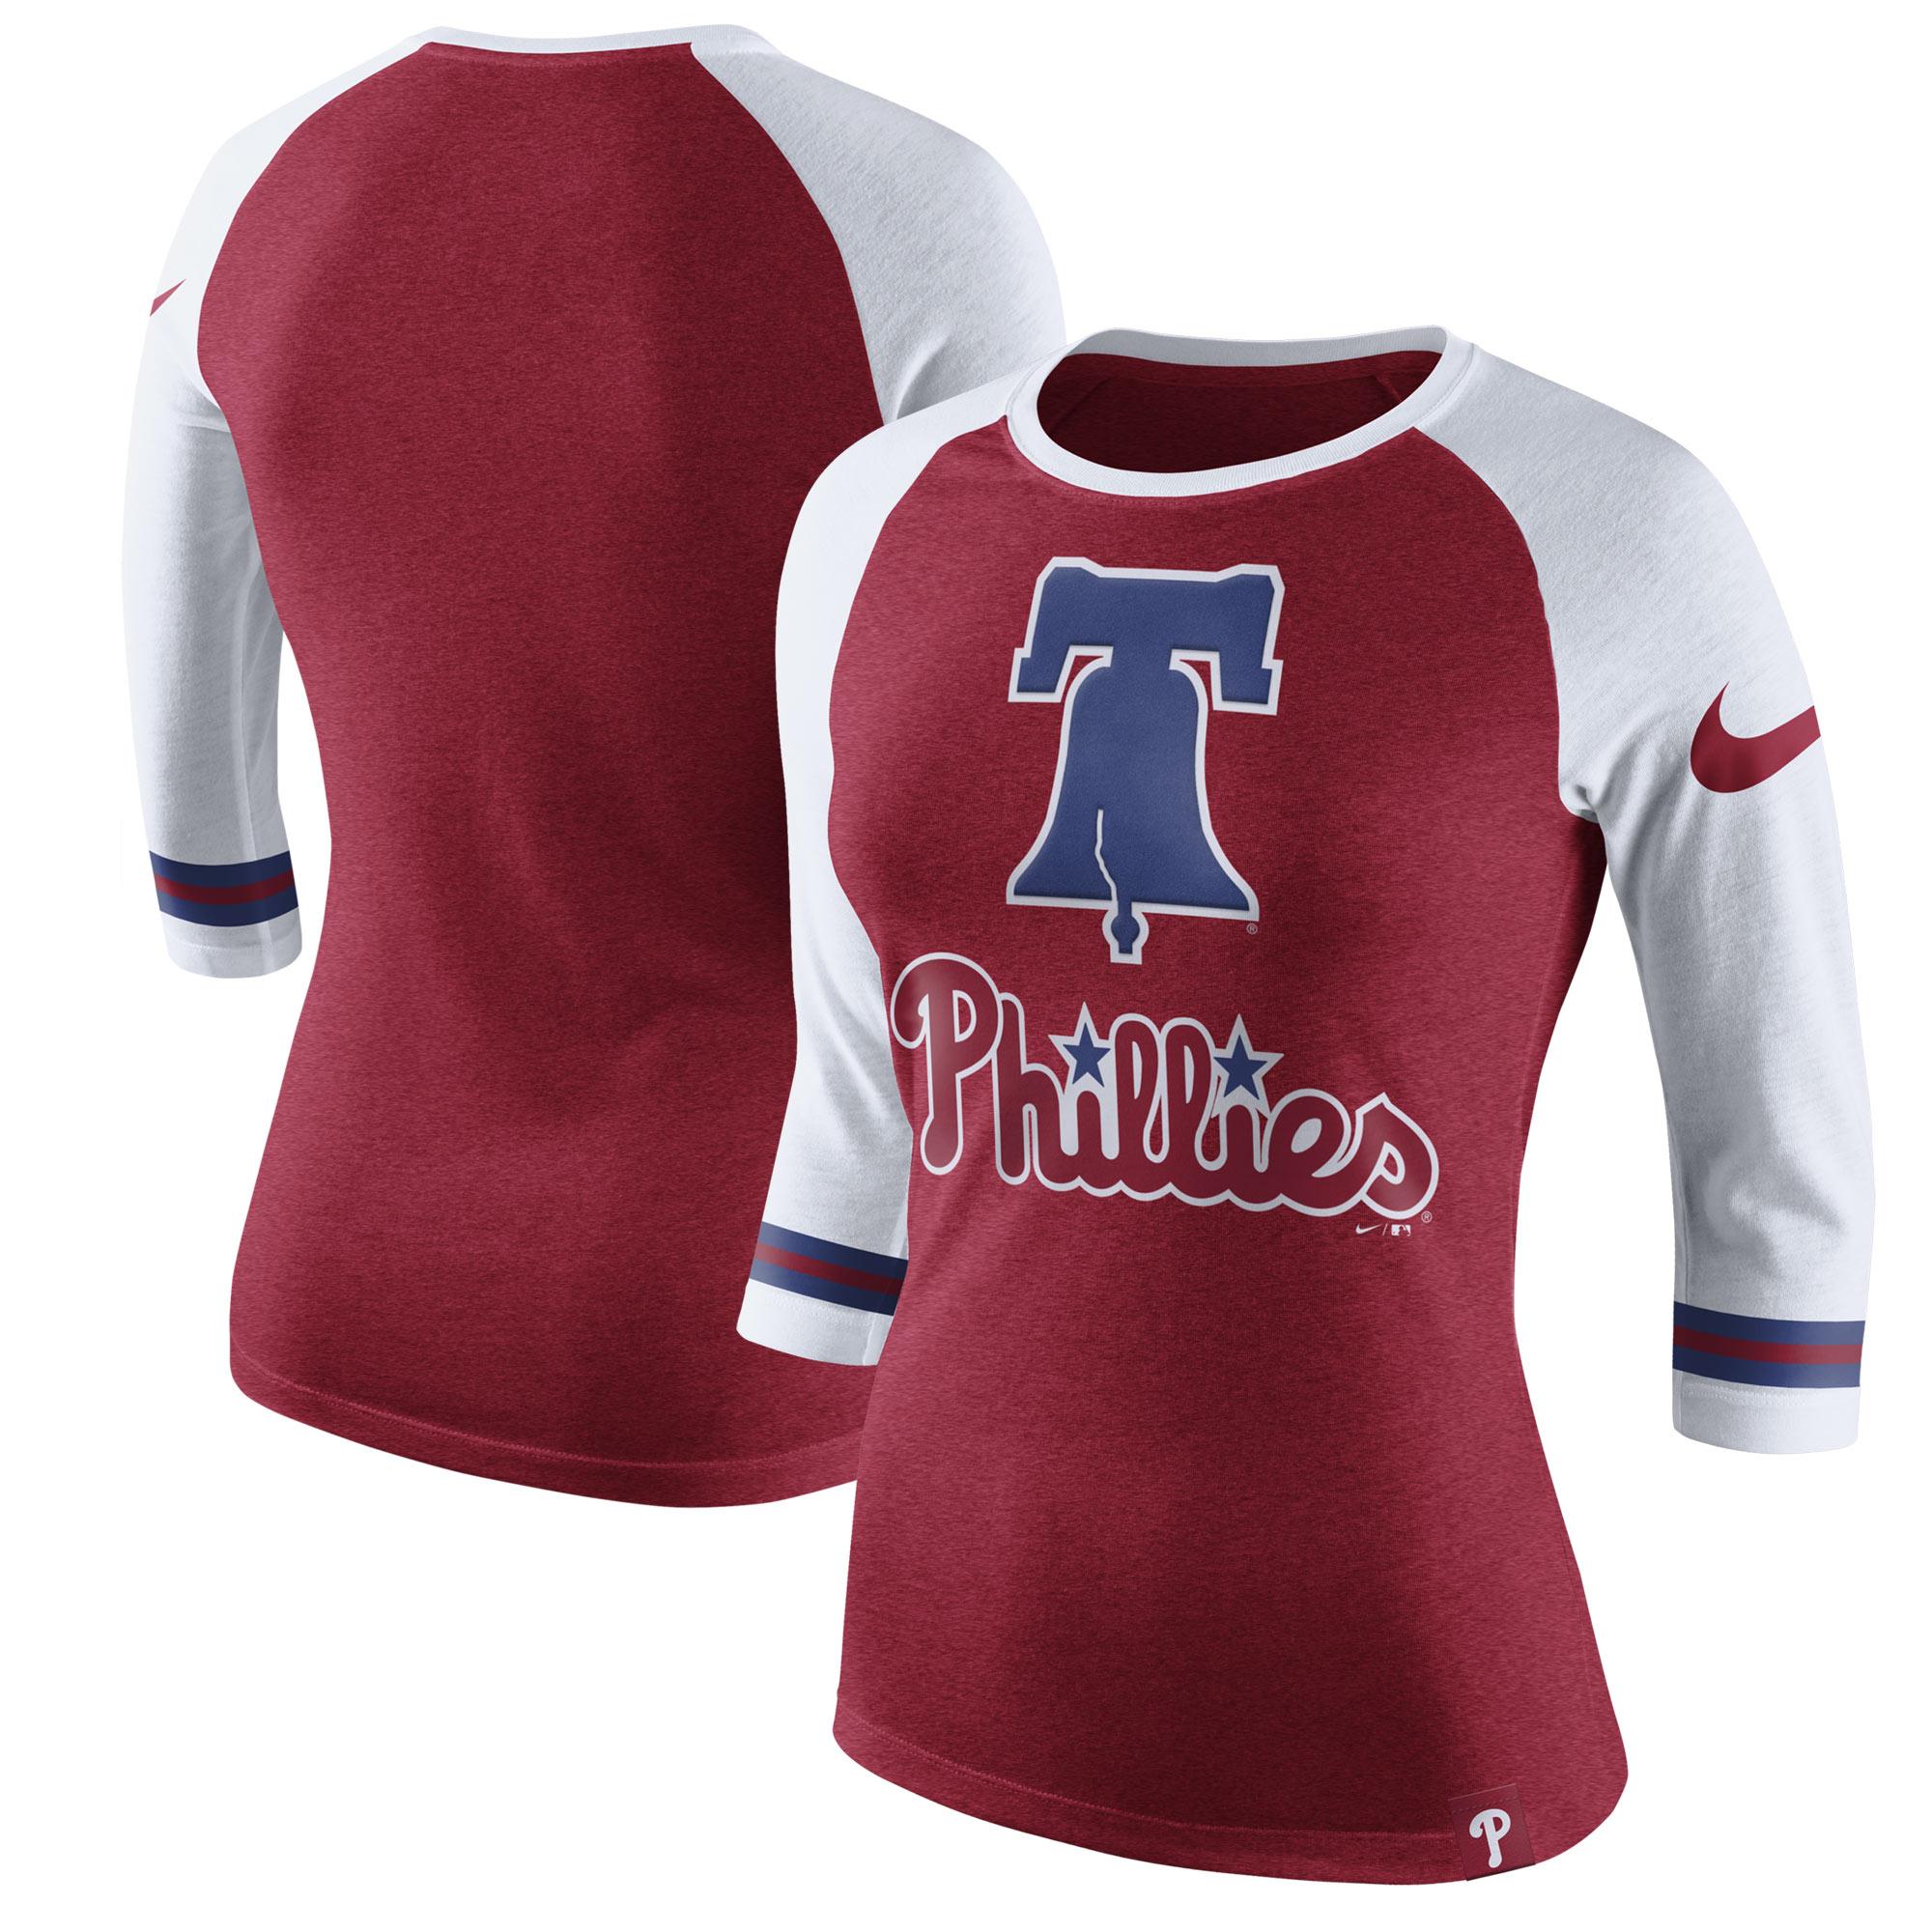 Philadelphia Phillies Nike Women's Tri-Blend 3/4-Sleeve Raglan T-Shirt - Heathered Red